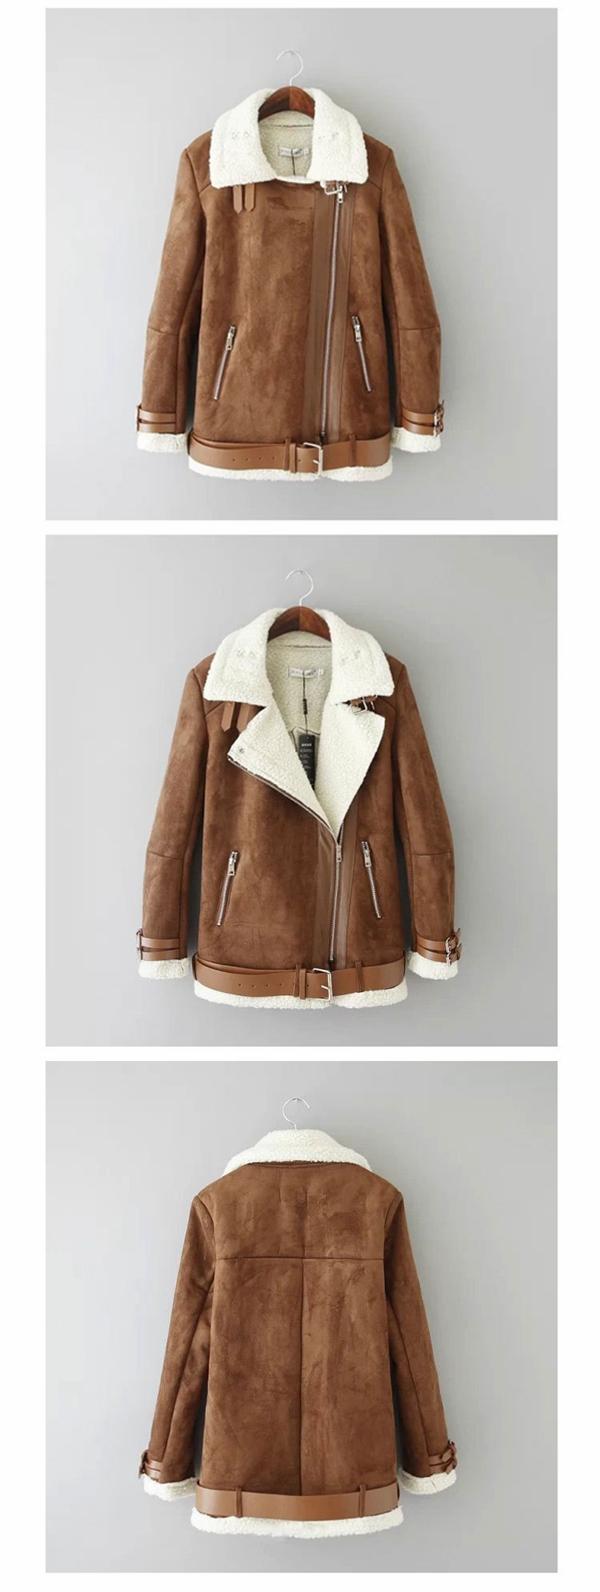 womens-suede-leather-polar-fleece-fashion-winter-coat-001